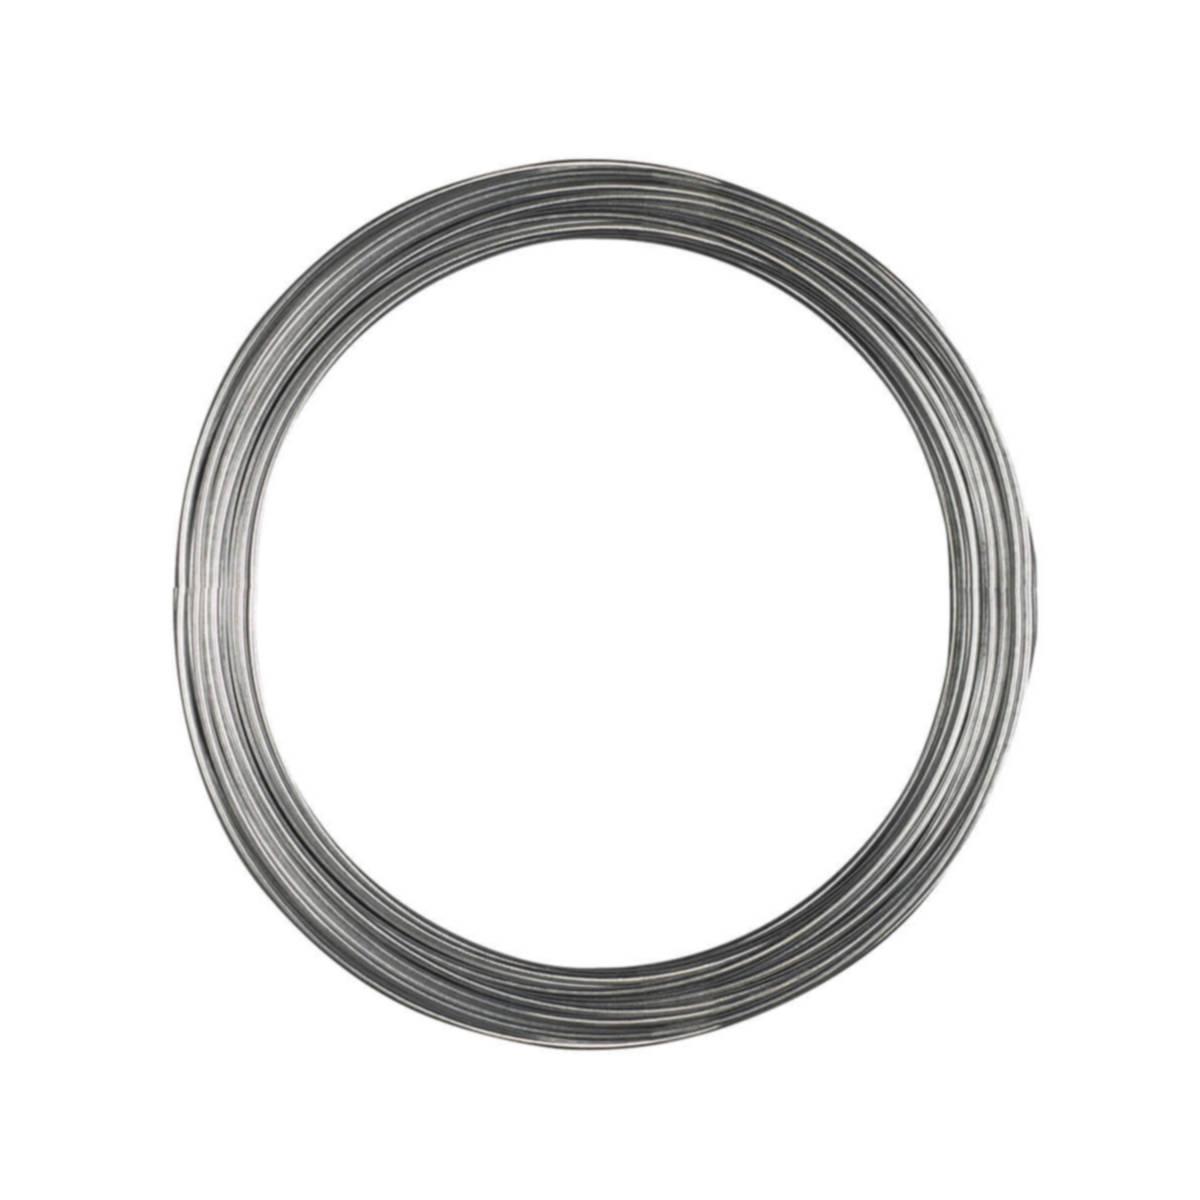 Ben-Mor Cables 93001